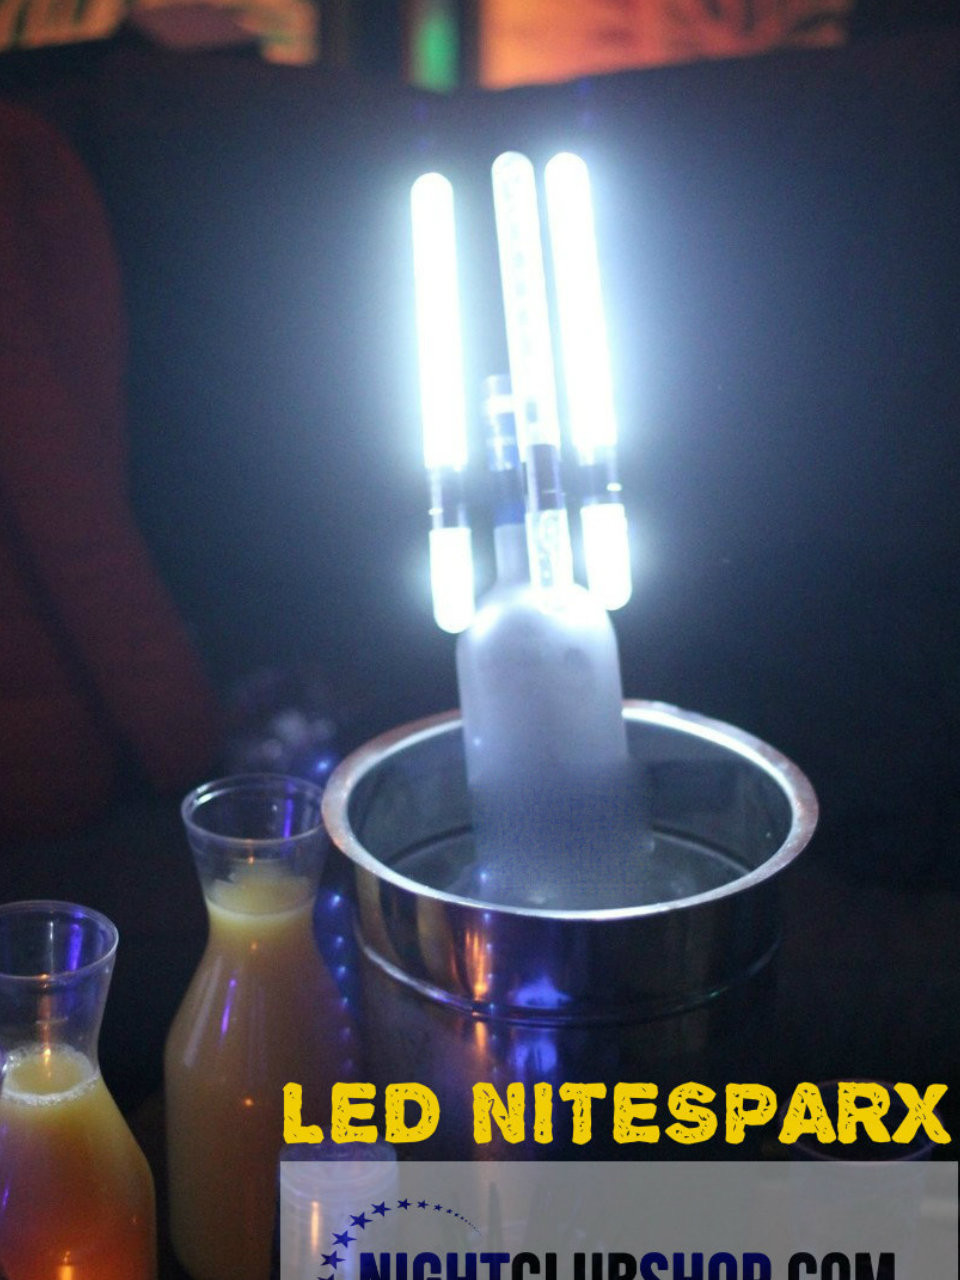 LED, Electronic, Bottle,Sparkler